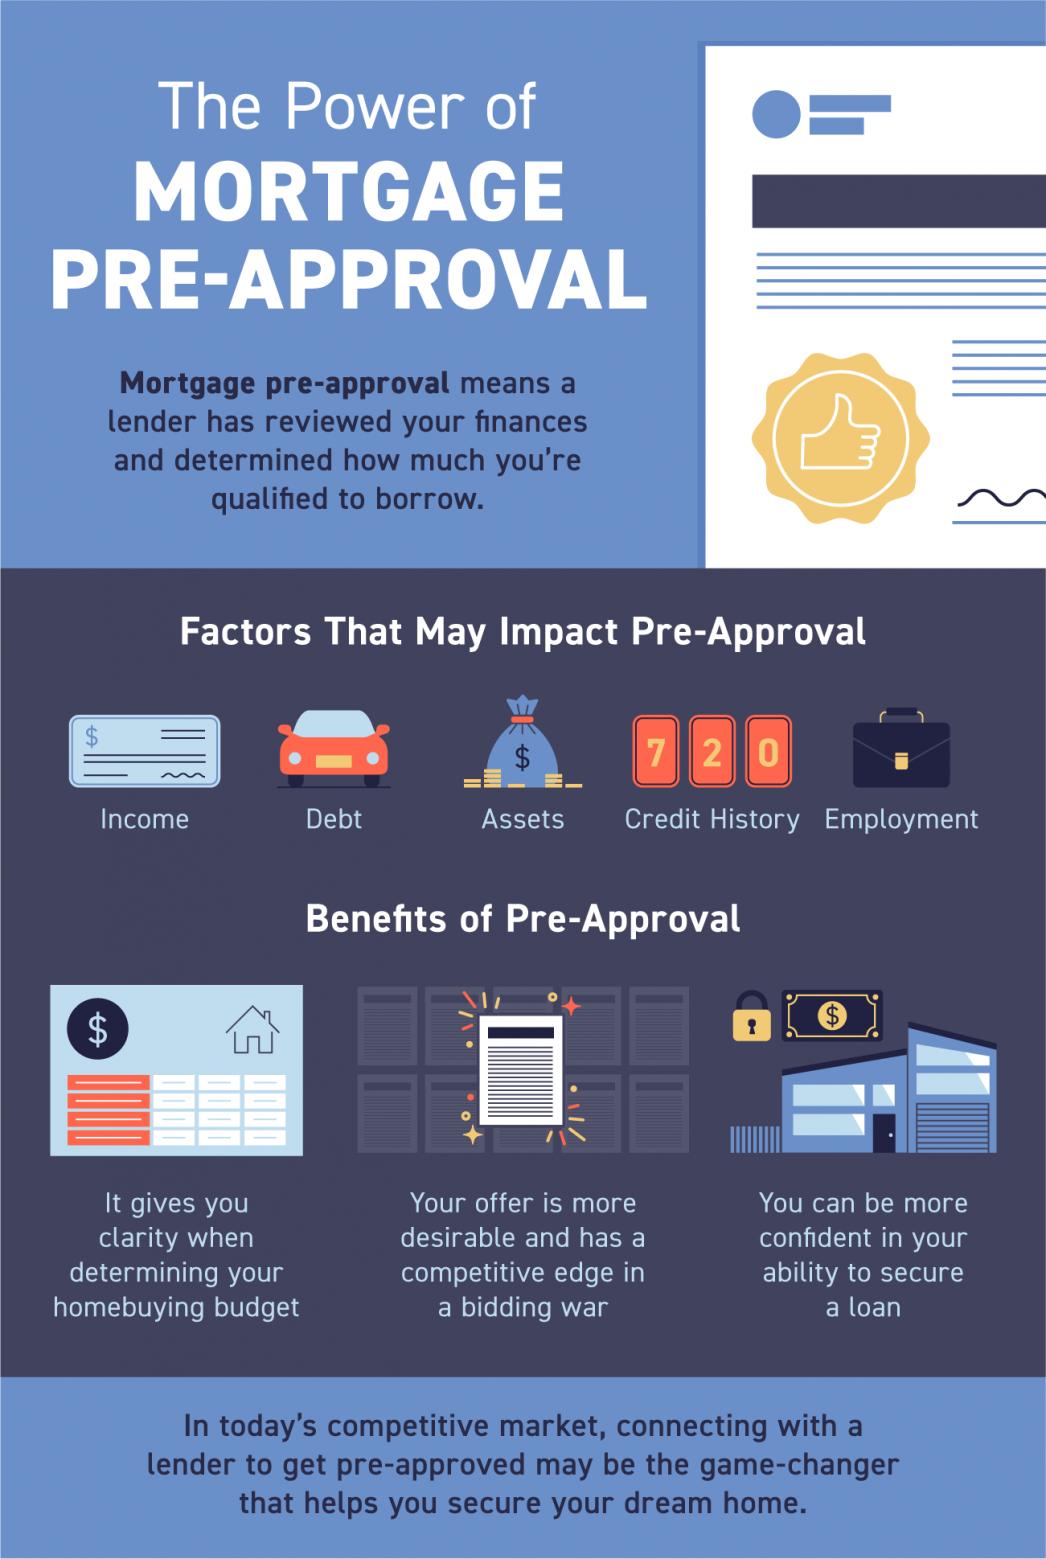 The Power of Mortgage Pre-Approval Tony Vejar - Luxury Az Living - Arizona Real Estate